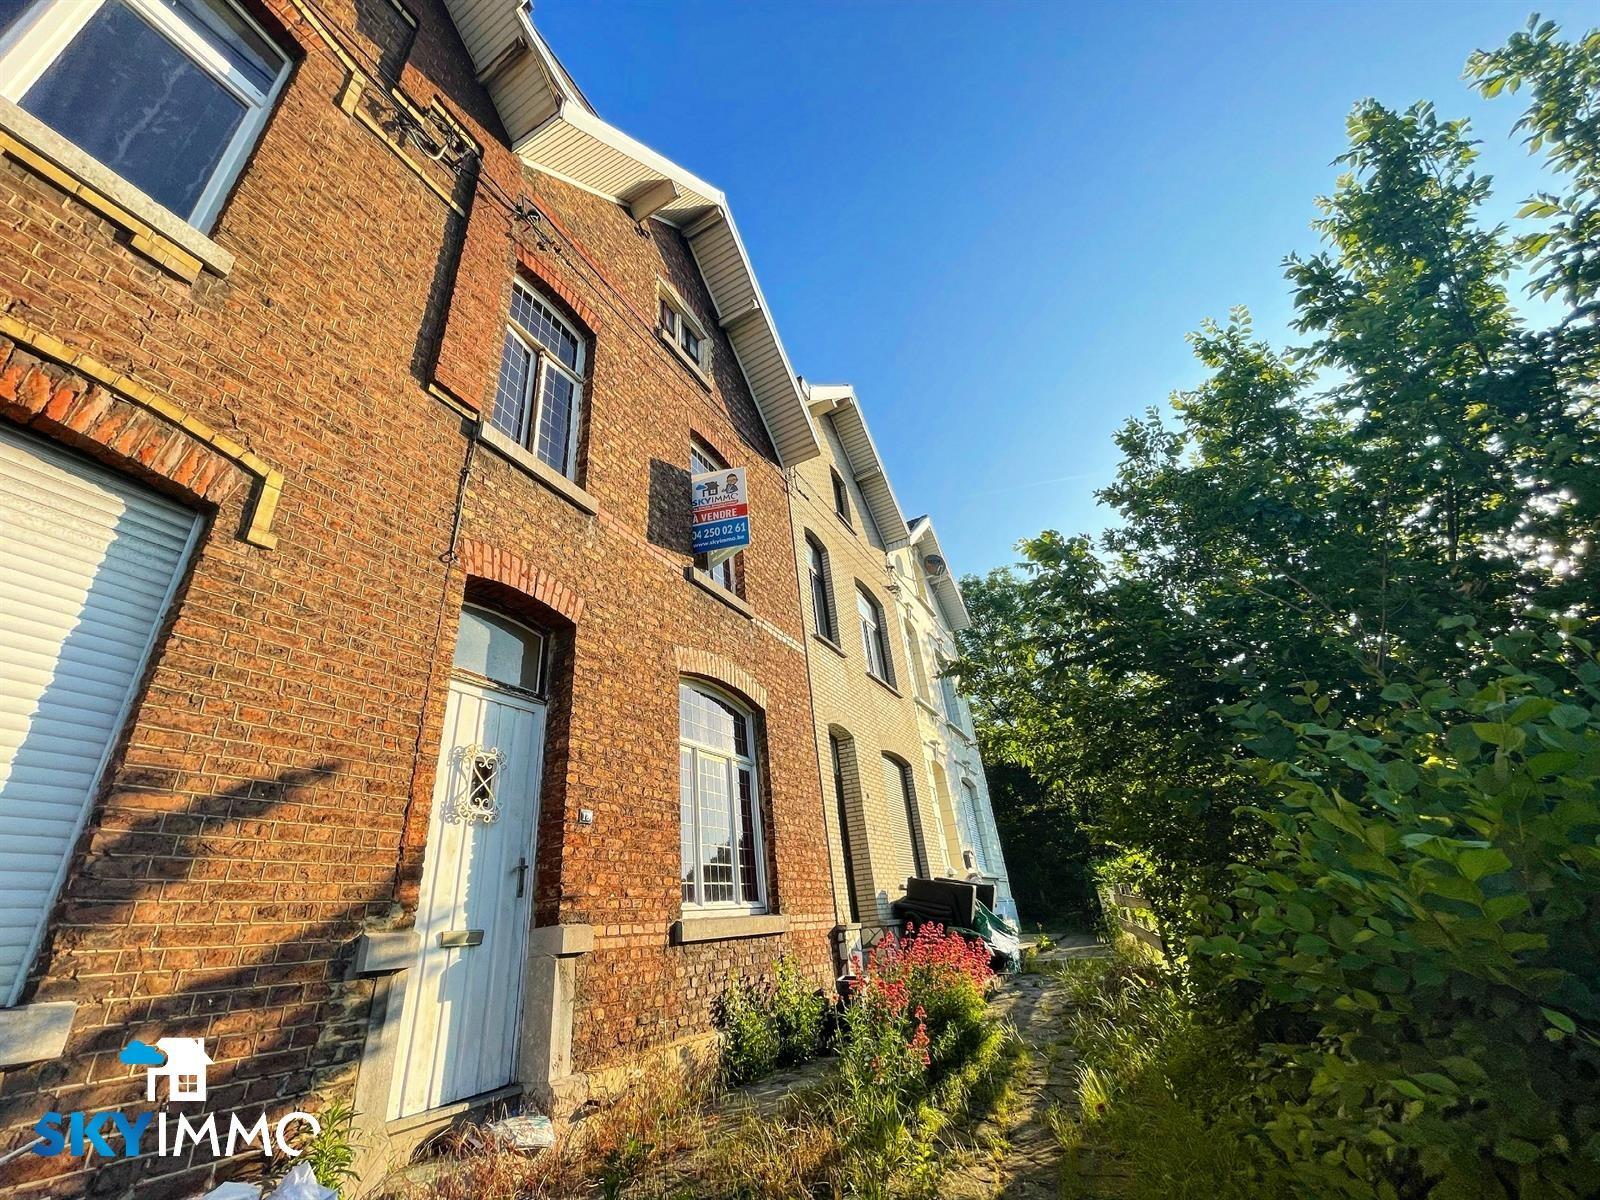 Maison - Seraing Jemeppesur-Meuse - #4383857-0